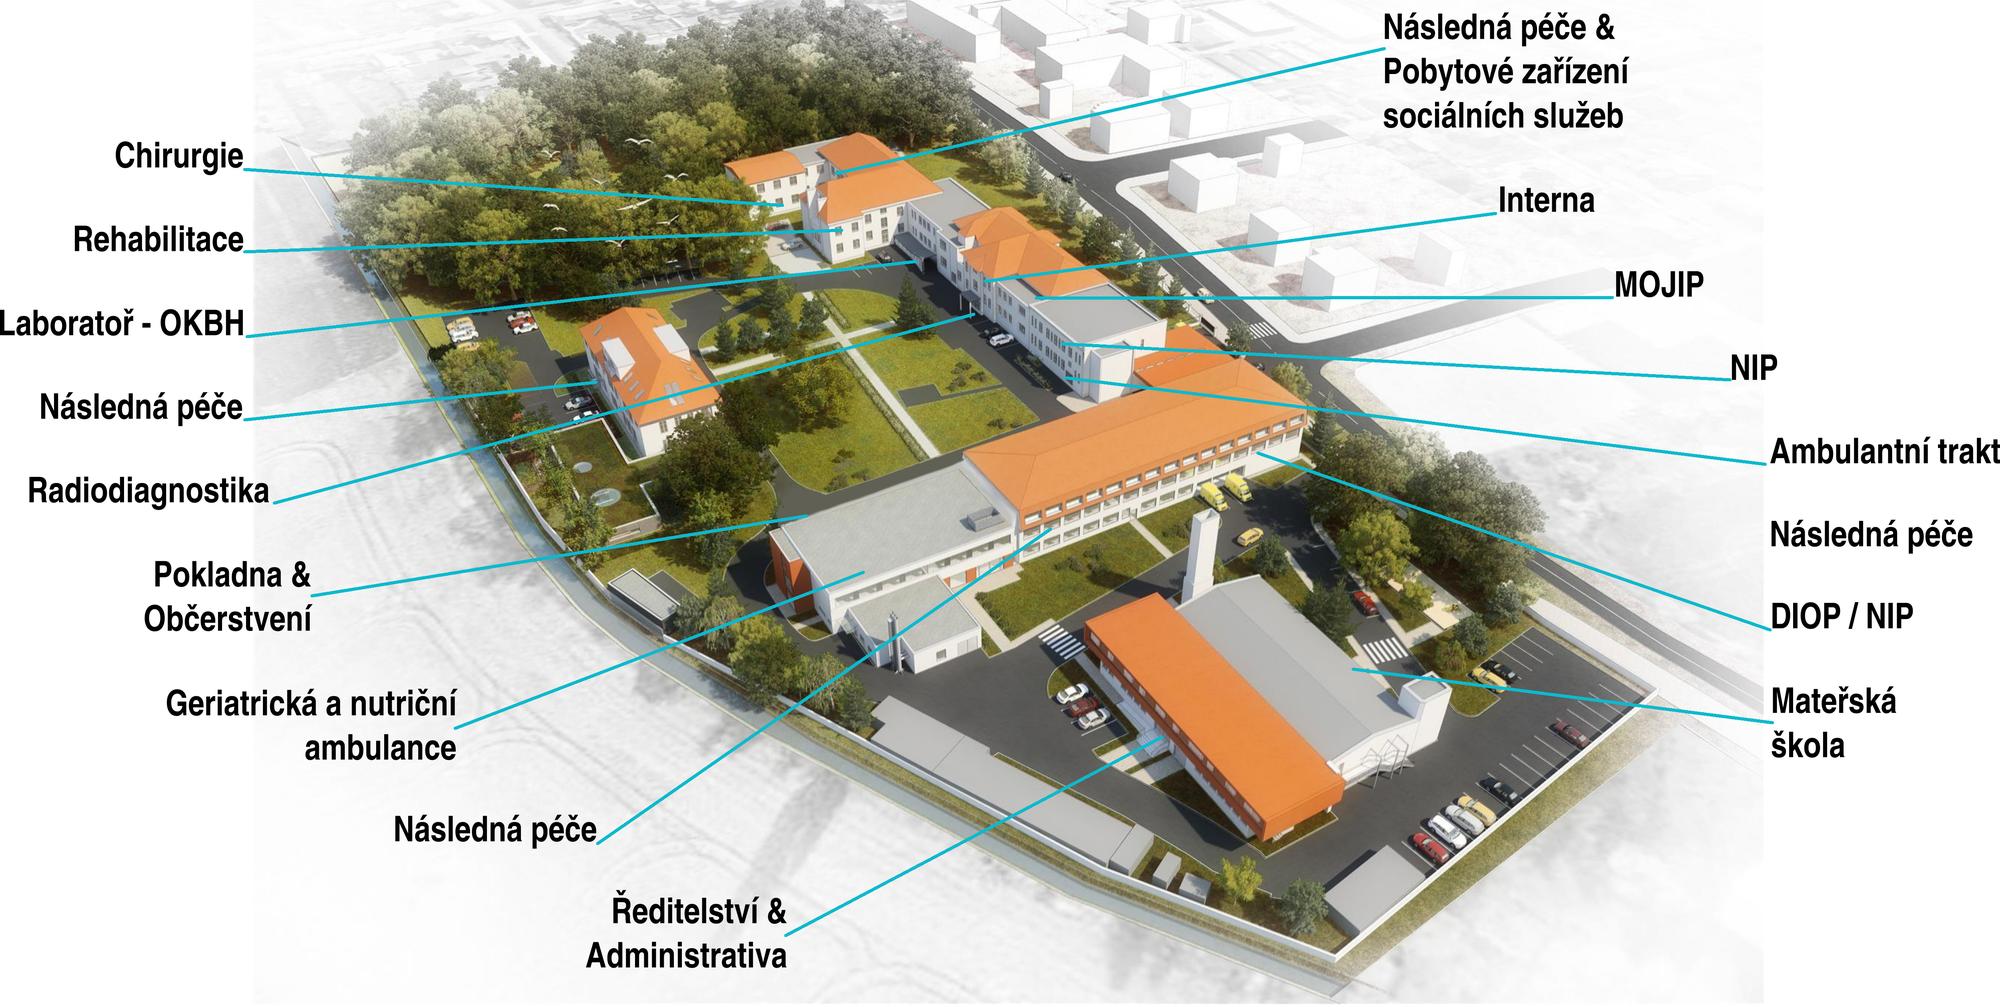 Mapa areálu nemocnice